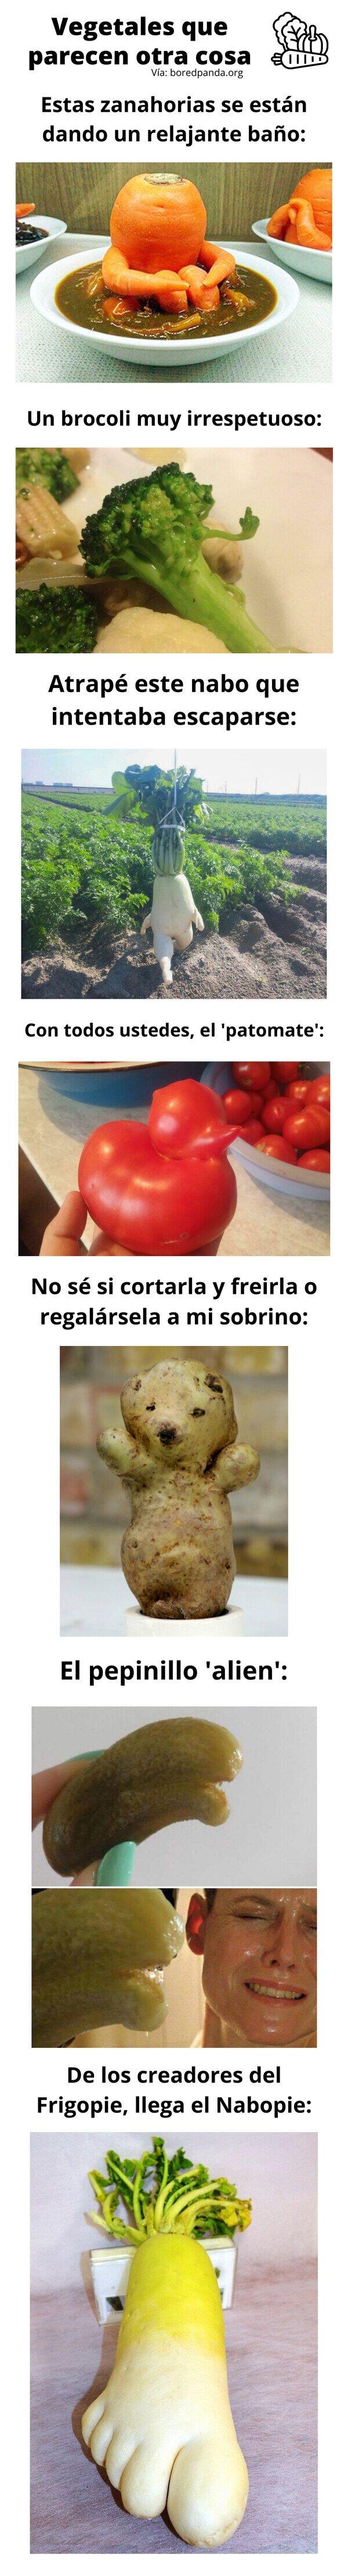 Meme_otros - Vegetales que parecen otra cosa